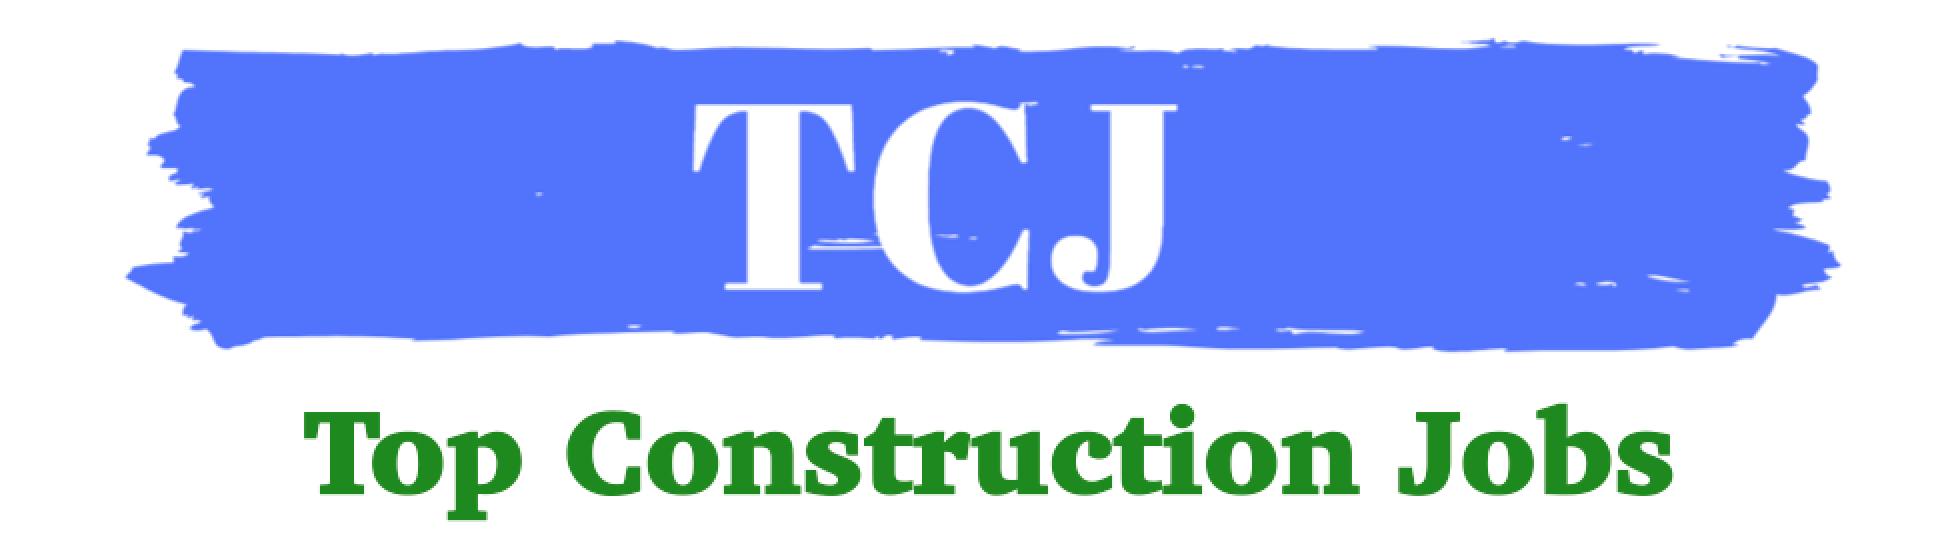 Top Construction Jobs